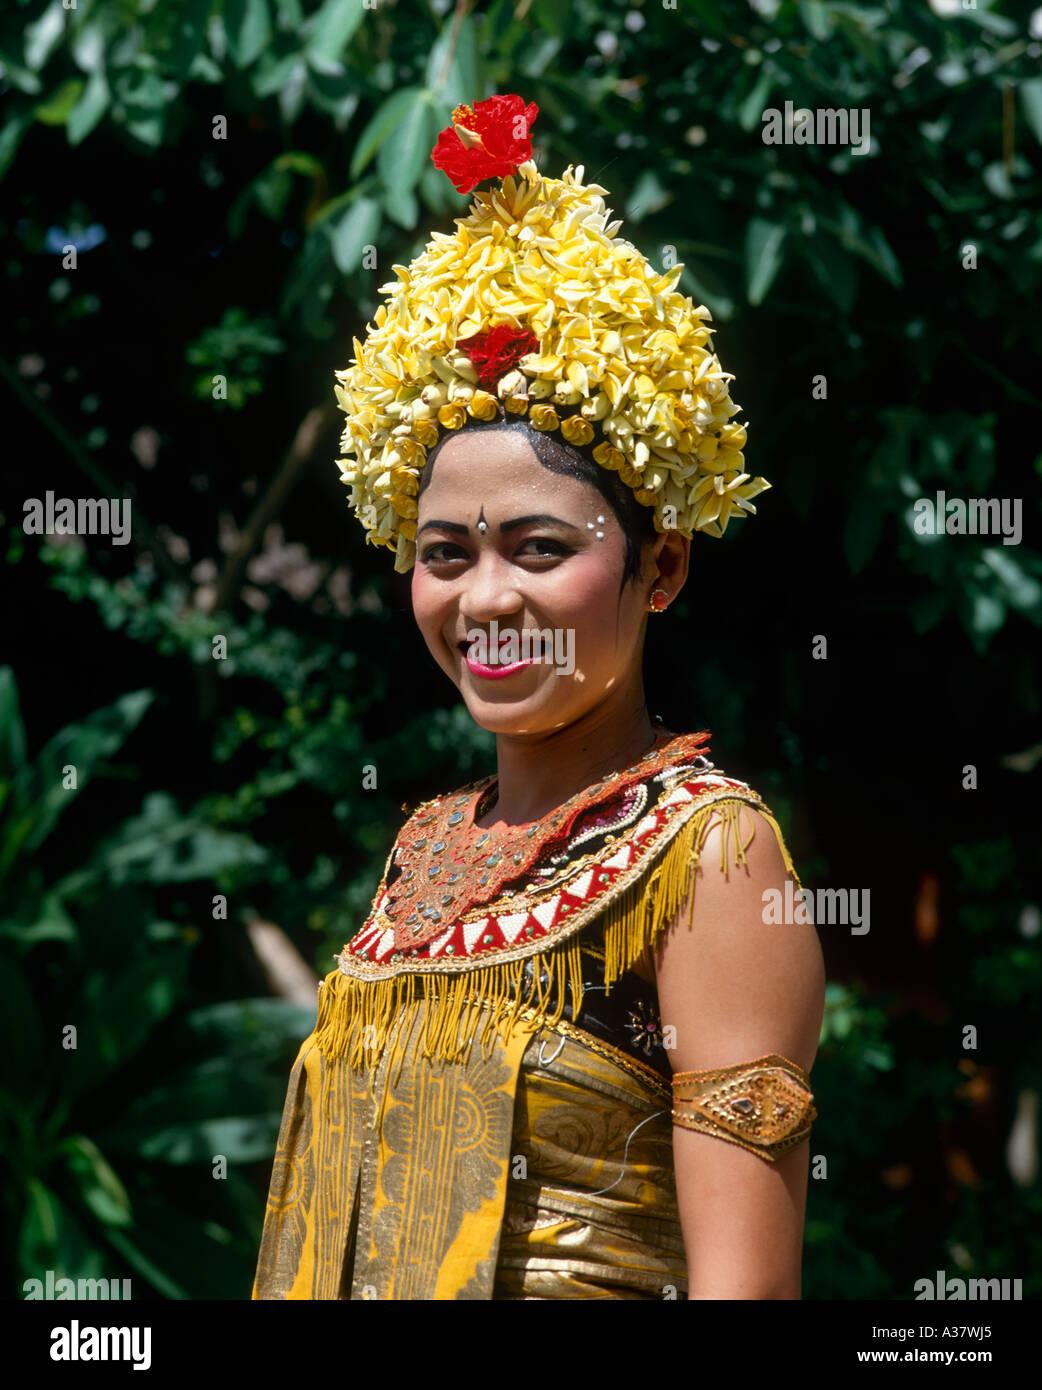 bali dancer smiling stock